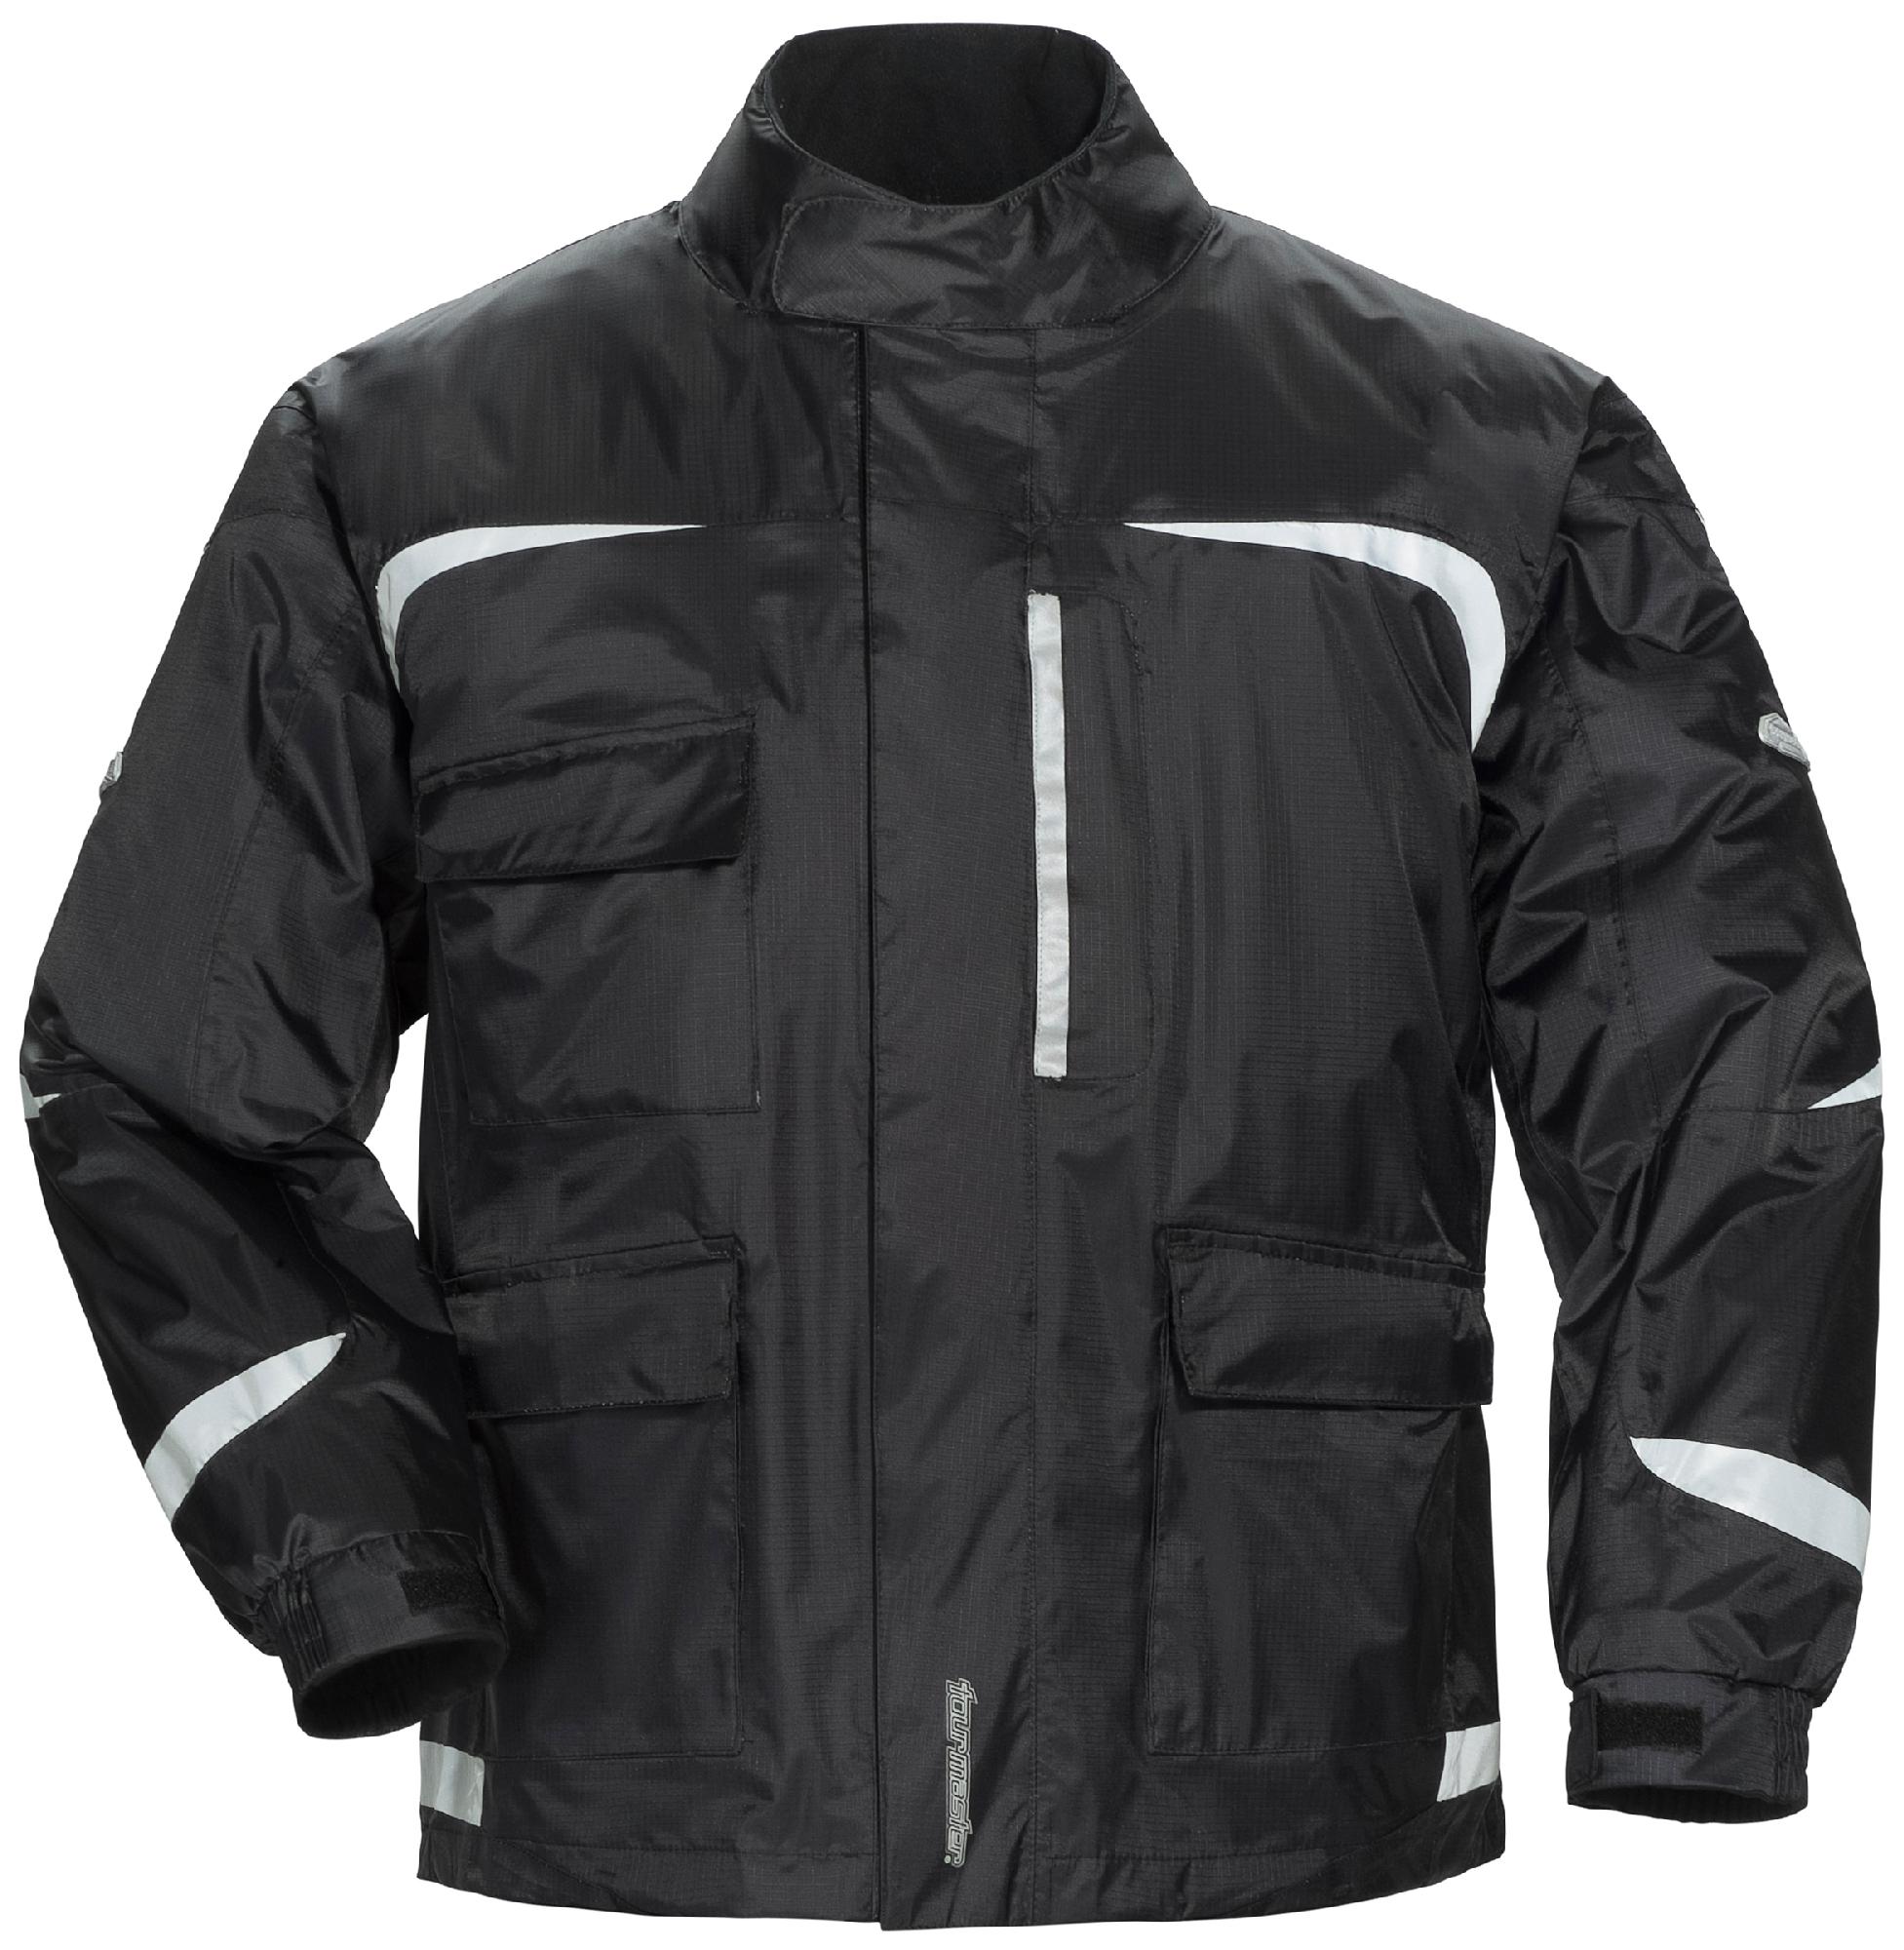 Tourmaster Black Mens XL Sentinel 2.0 Motorcycle Rain Jacket Extra Large